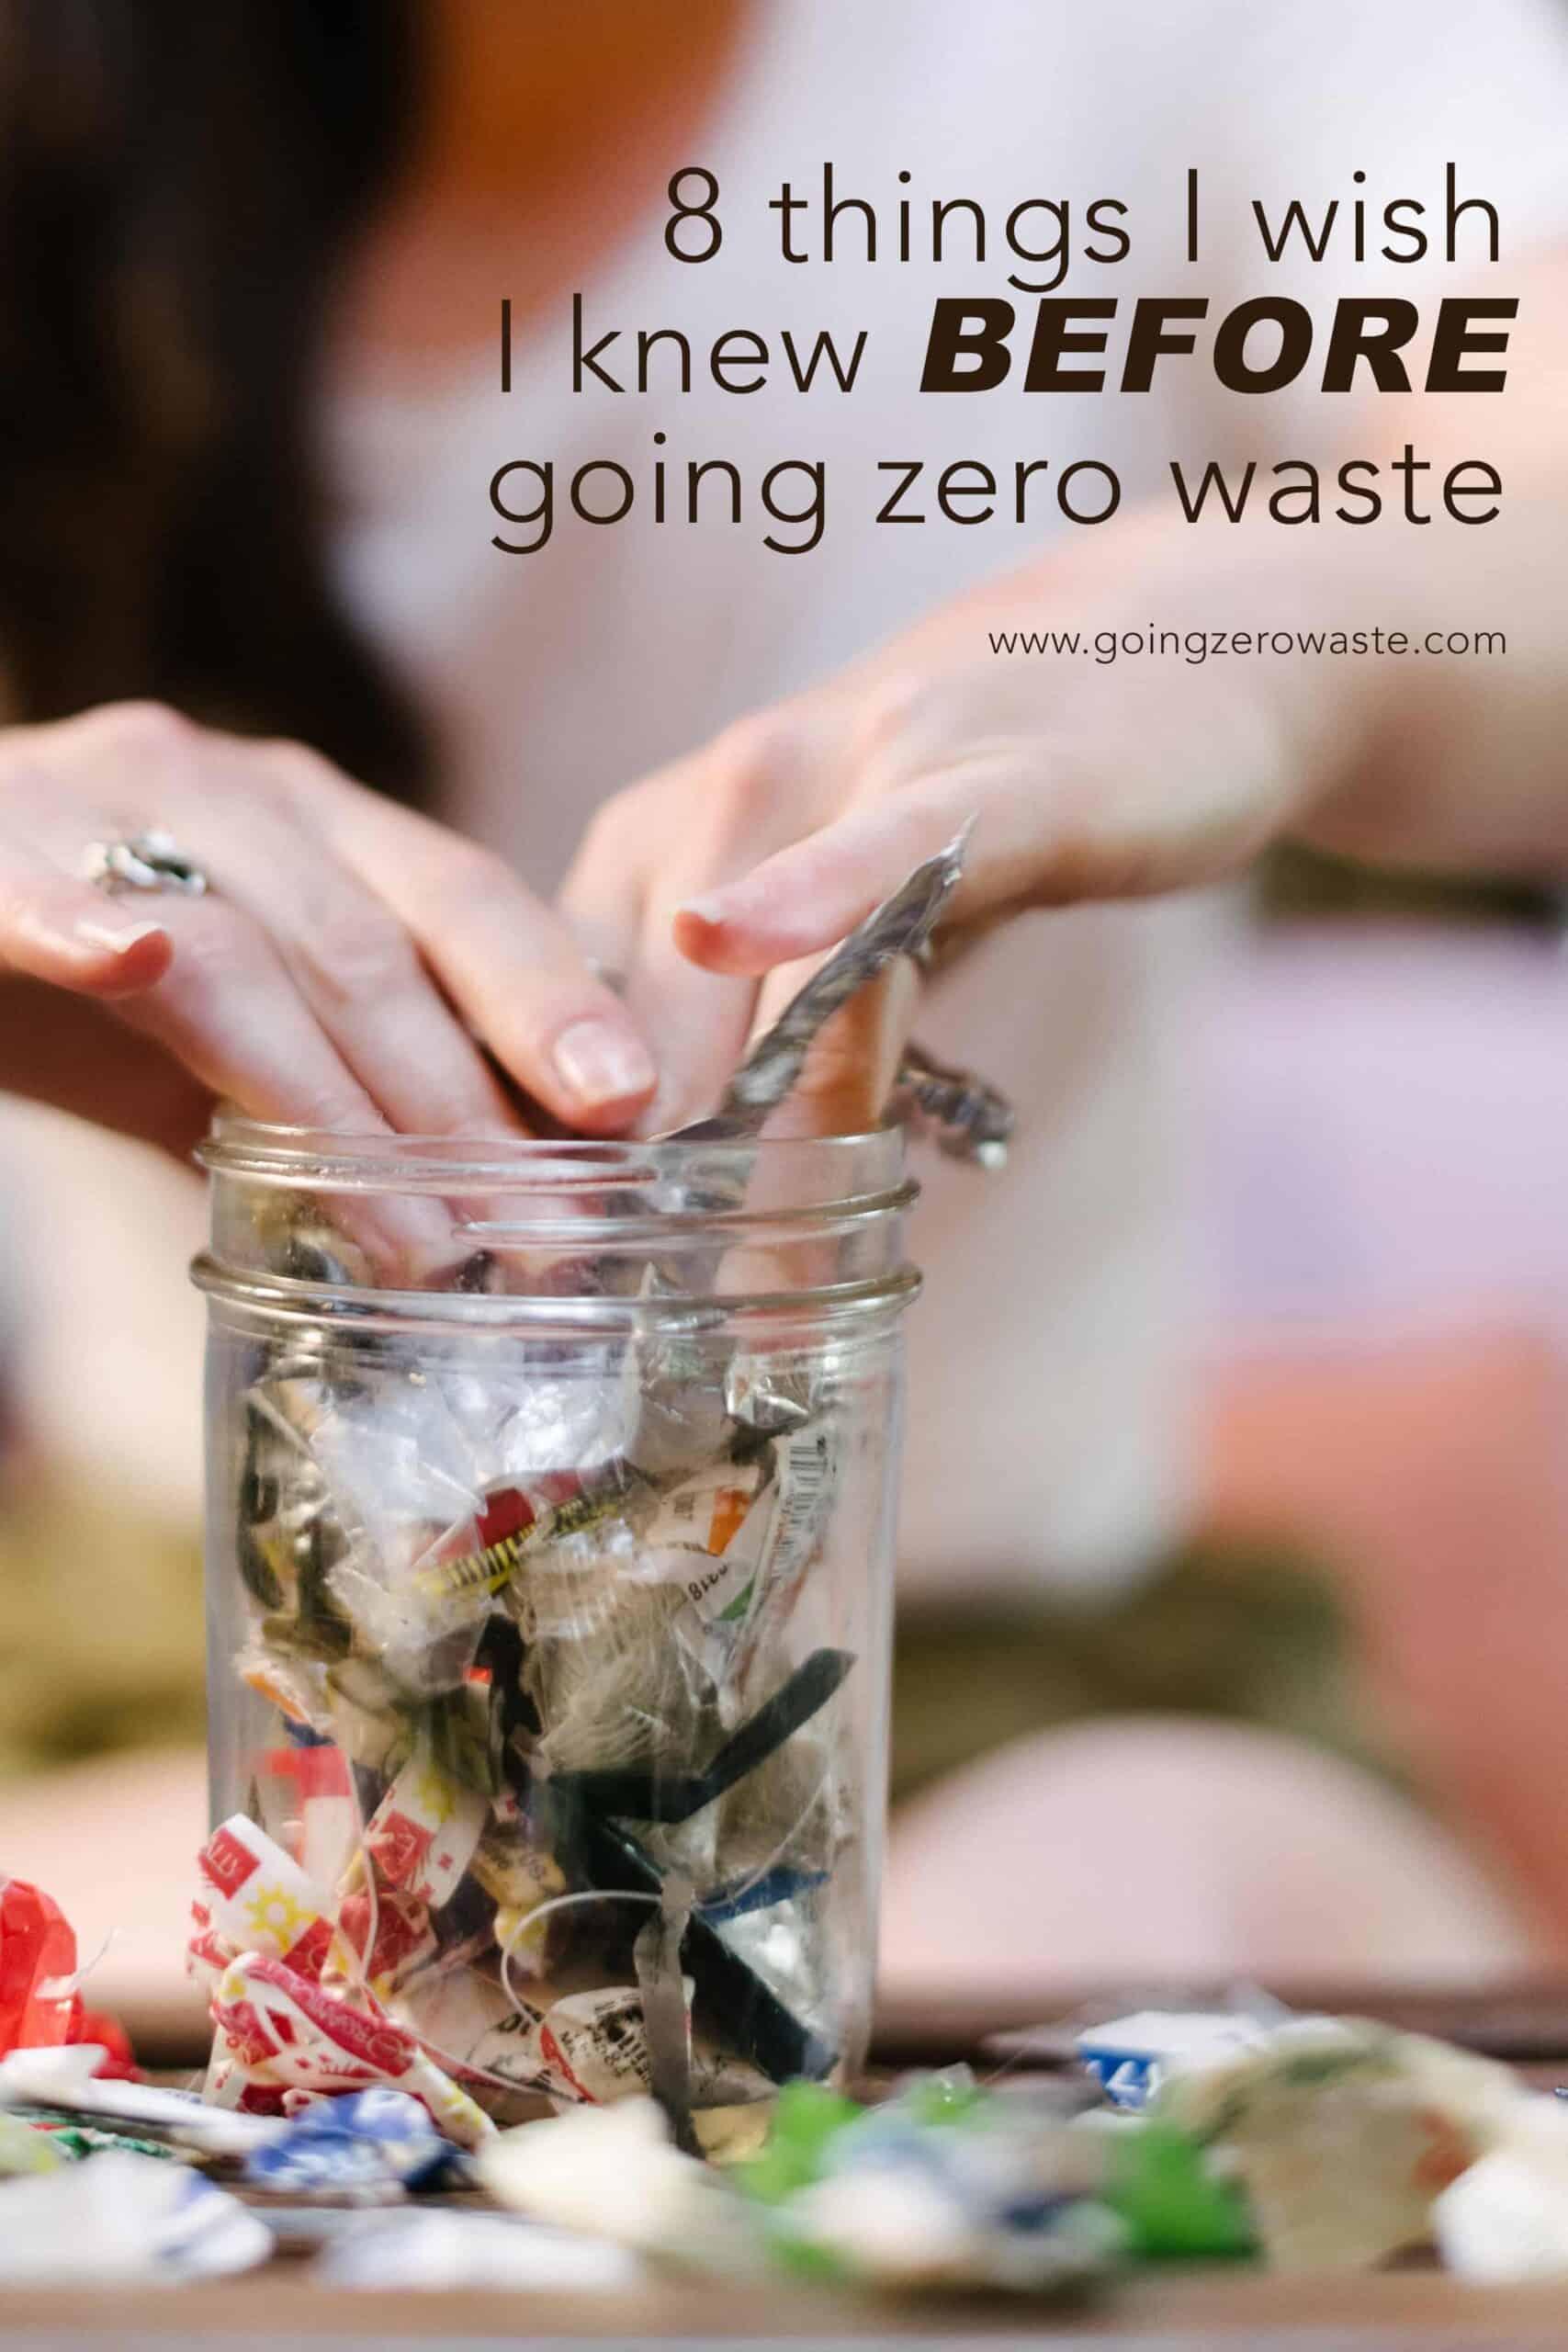 8 Things I Wish I Knew BEFORE Going Zero Waste from www.goingzerowaste.com #zerowaste #ecofriendly #gogreen #sustainable #zerowasteliving